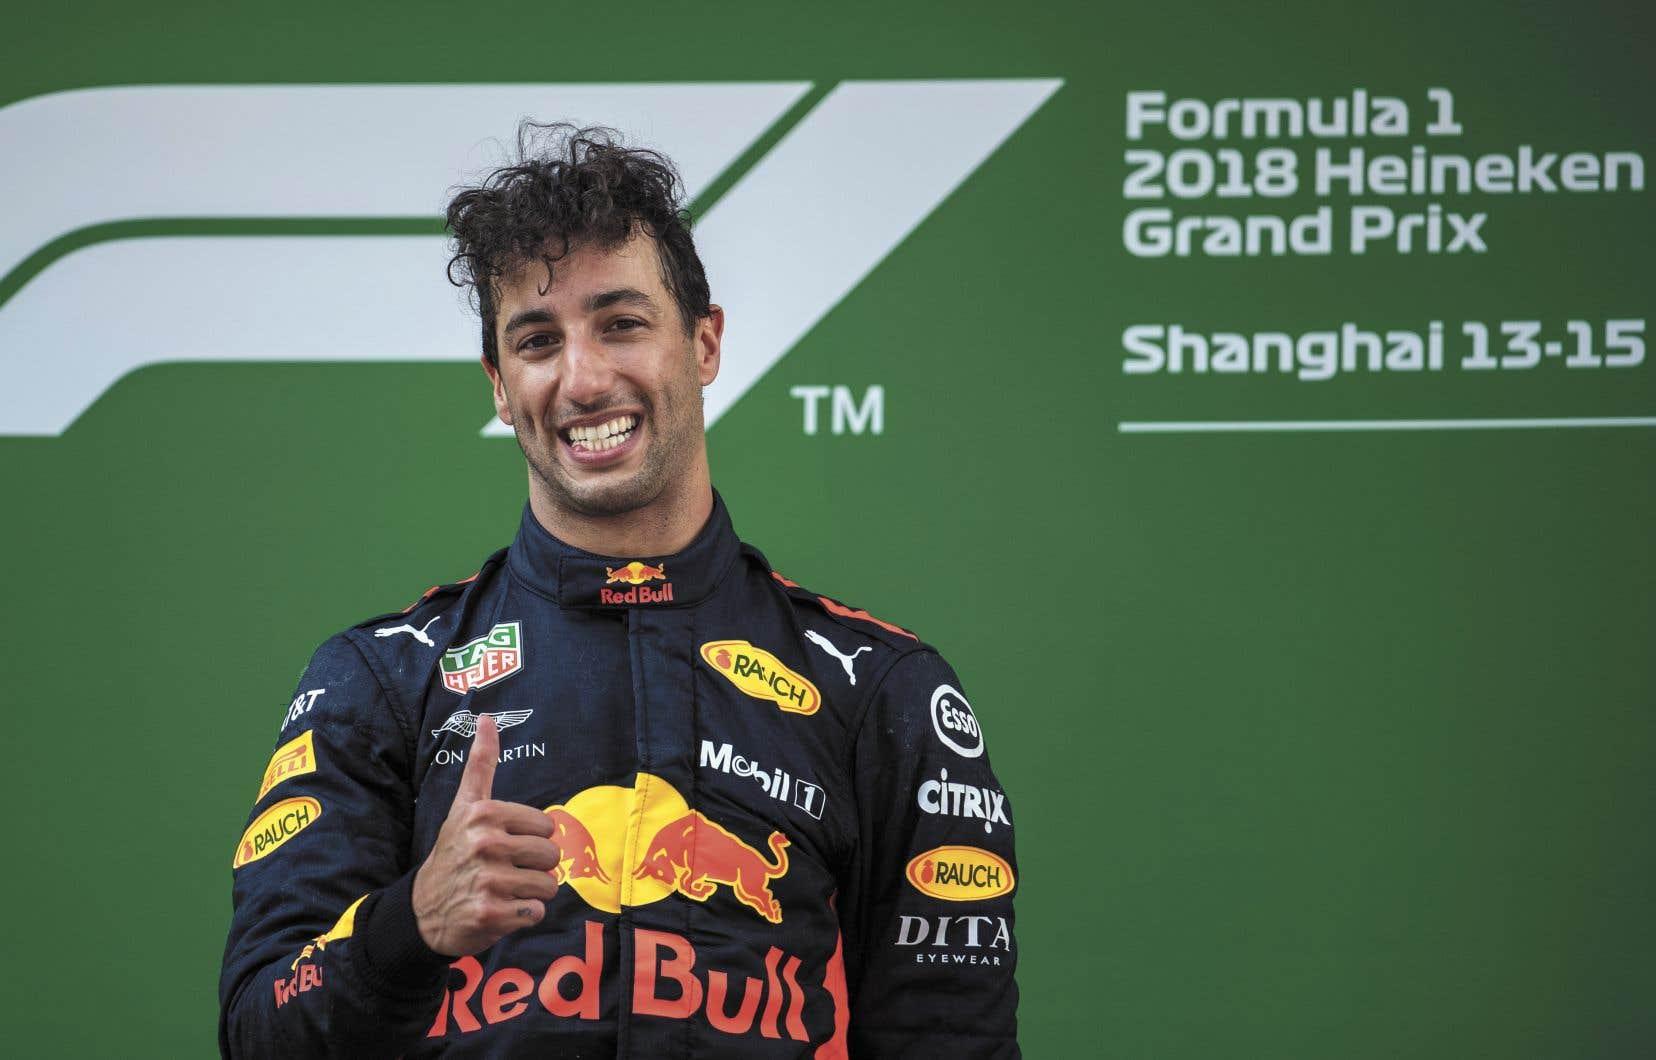 Daniel Ricciardo de Red Bull s'est imposé devant Valterri Bottas de Mercedes et Kimi Raikkonen de Ferrari.